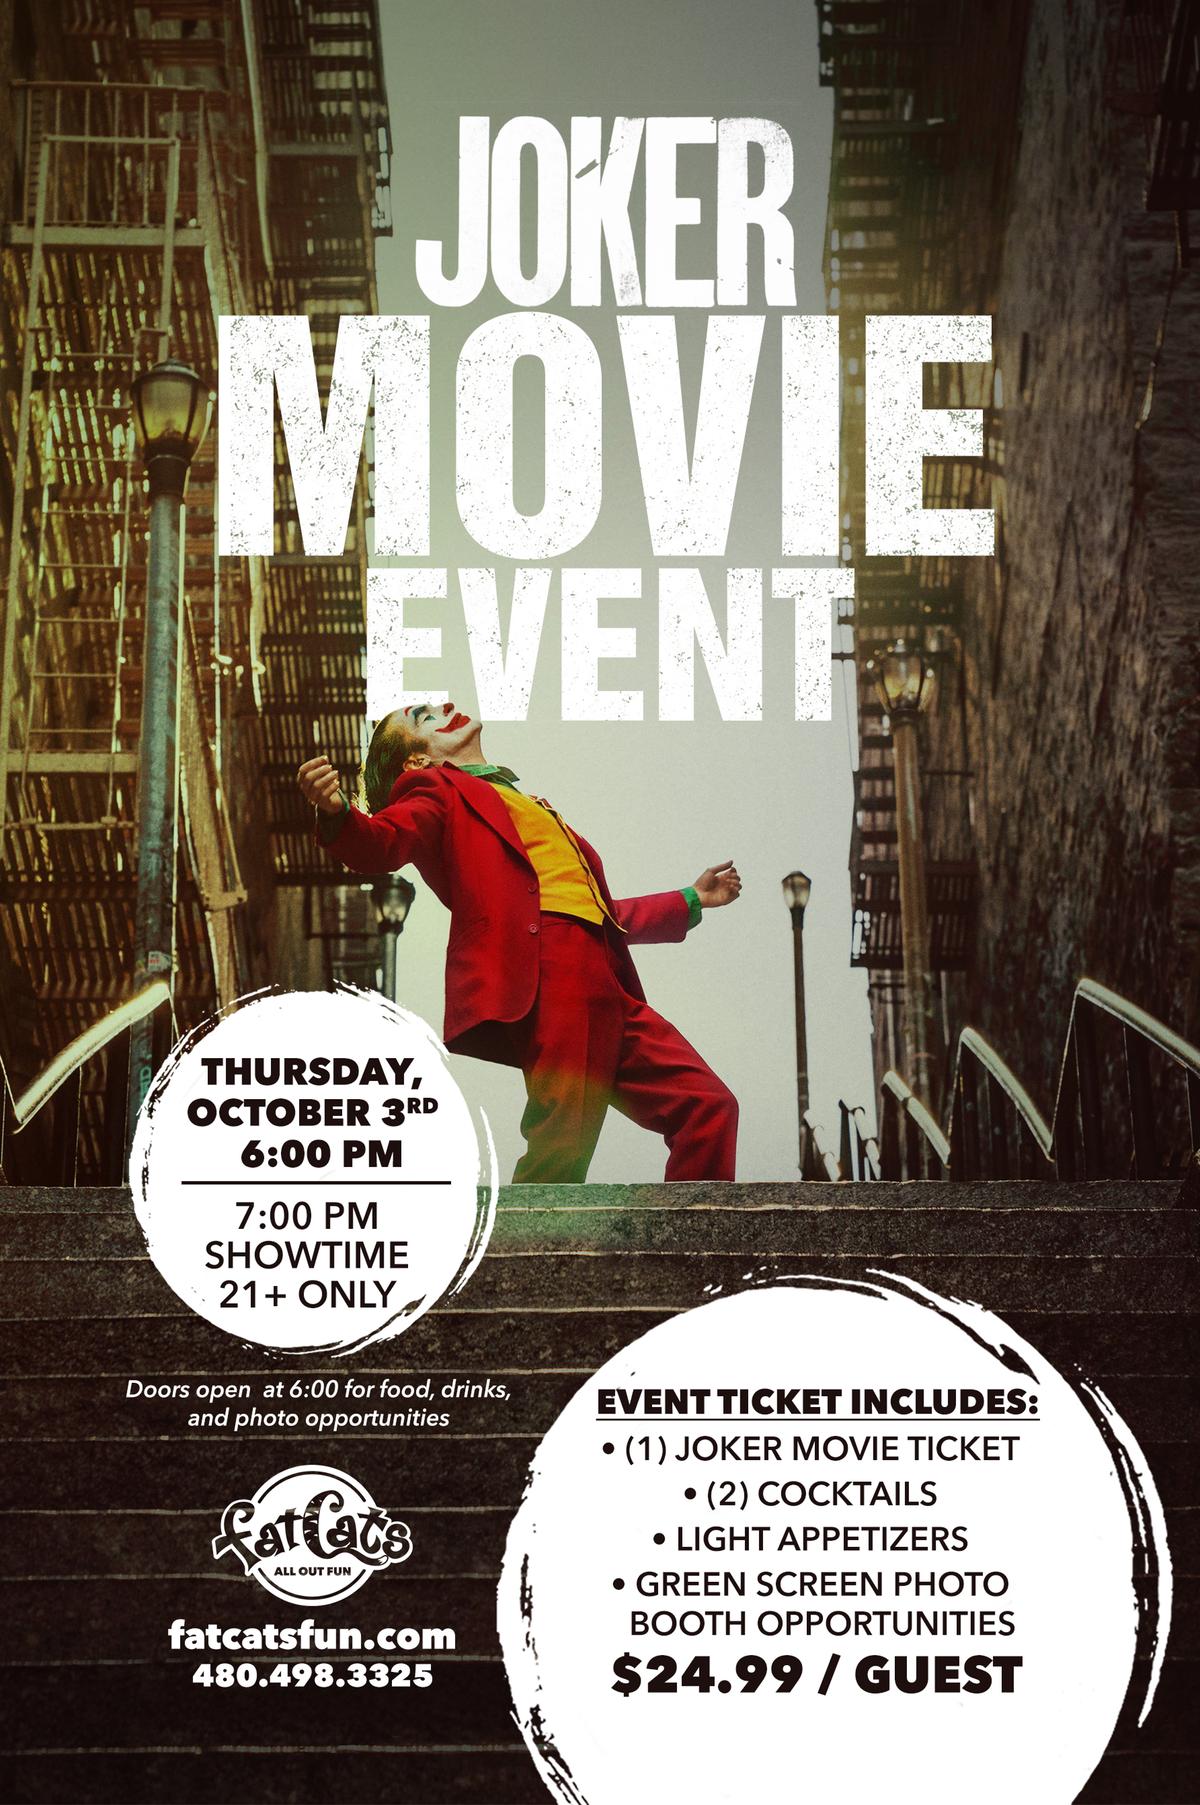 Joker Movie Event Poster